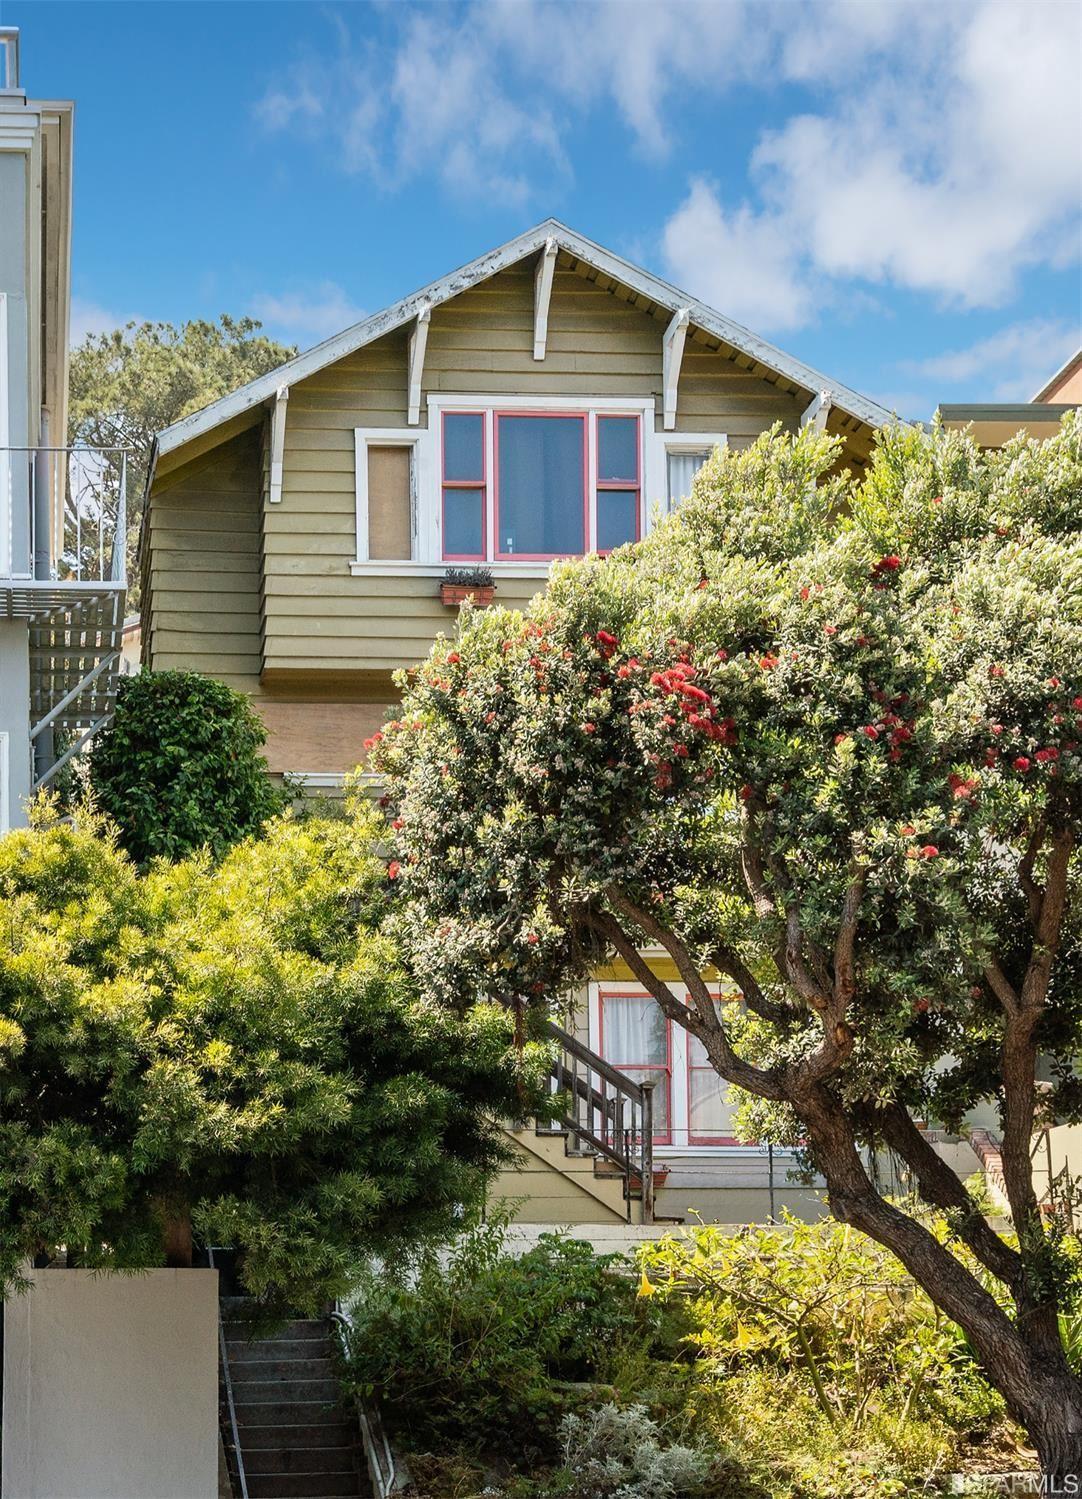 254 Roosevelt Way, San Francisco, CA 94114 - #: 421579345